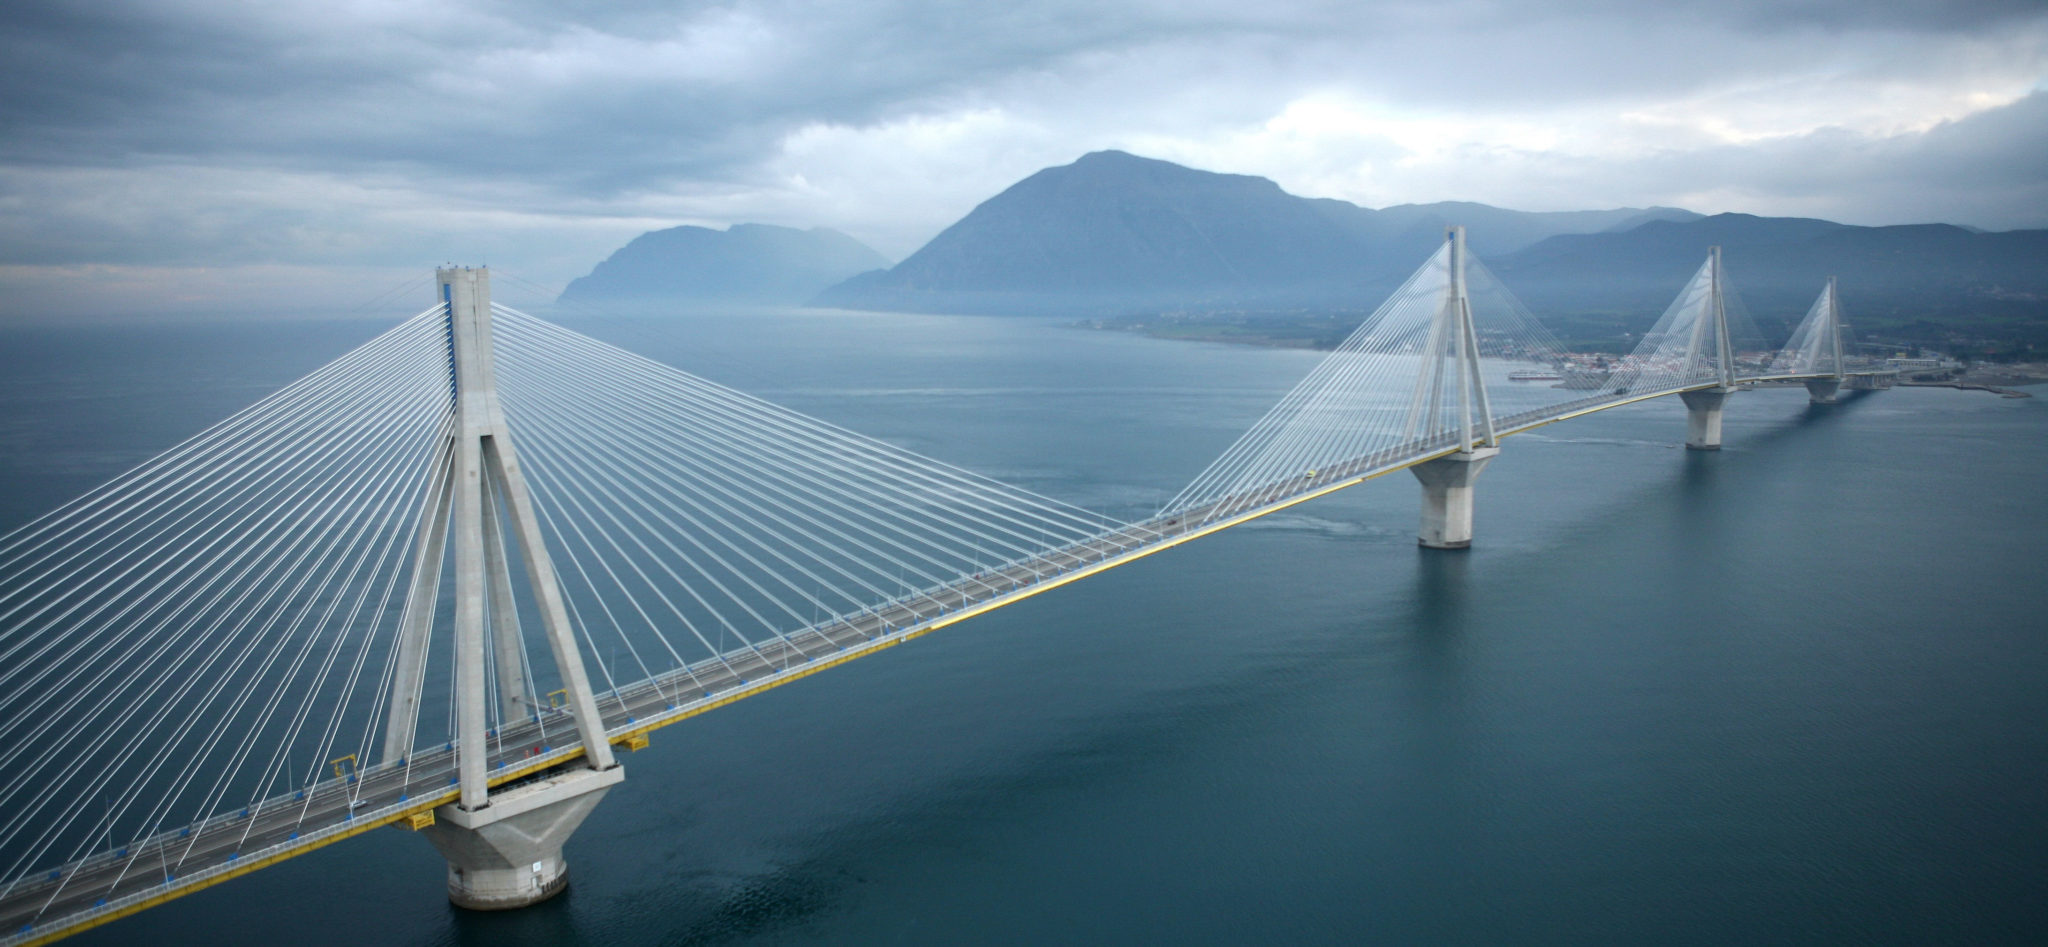 Photo of Το θαύμα της γεφυρας Ρίου – Αντιρίου.Δειτε πως φτιάχτηκαν τα θεμέλια της πάνω σε λασπώδες βυθό και σεισμογενές ρήγμα!!!